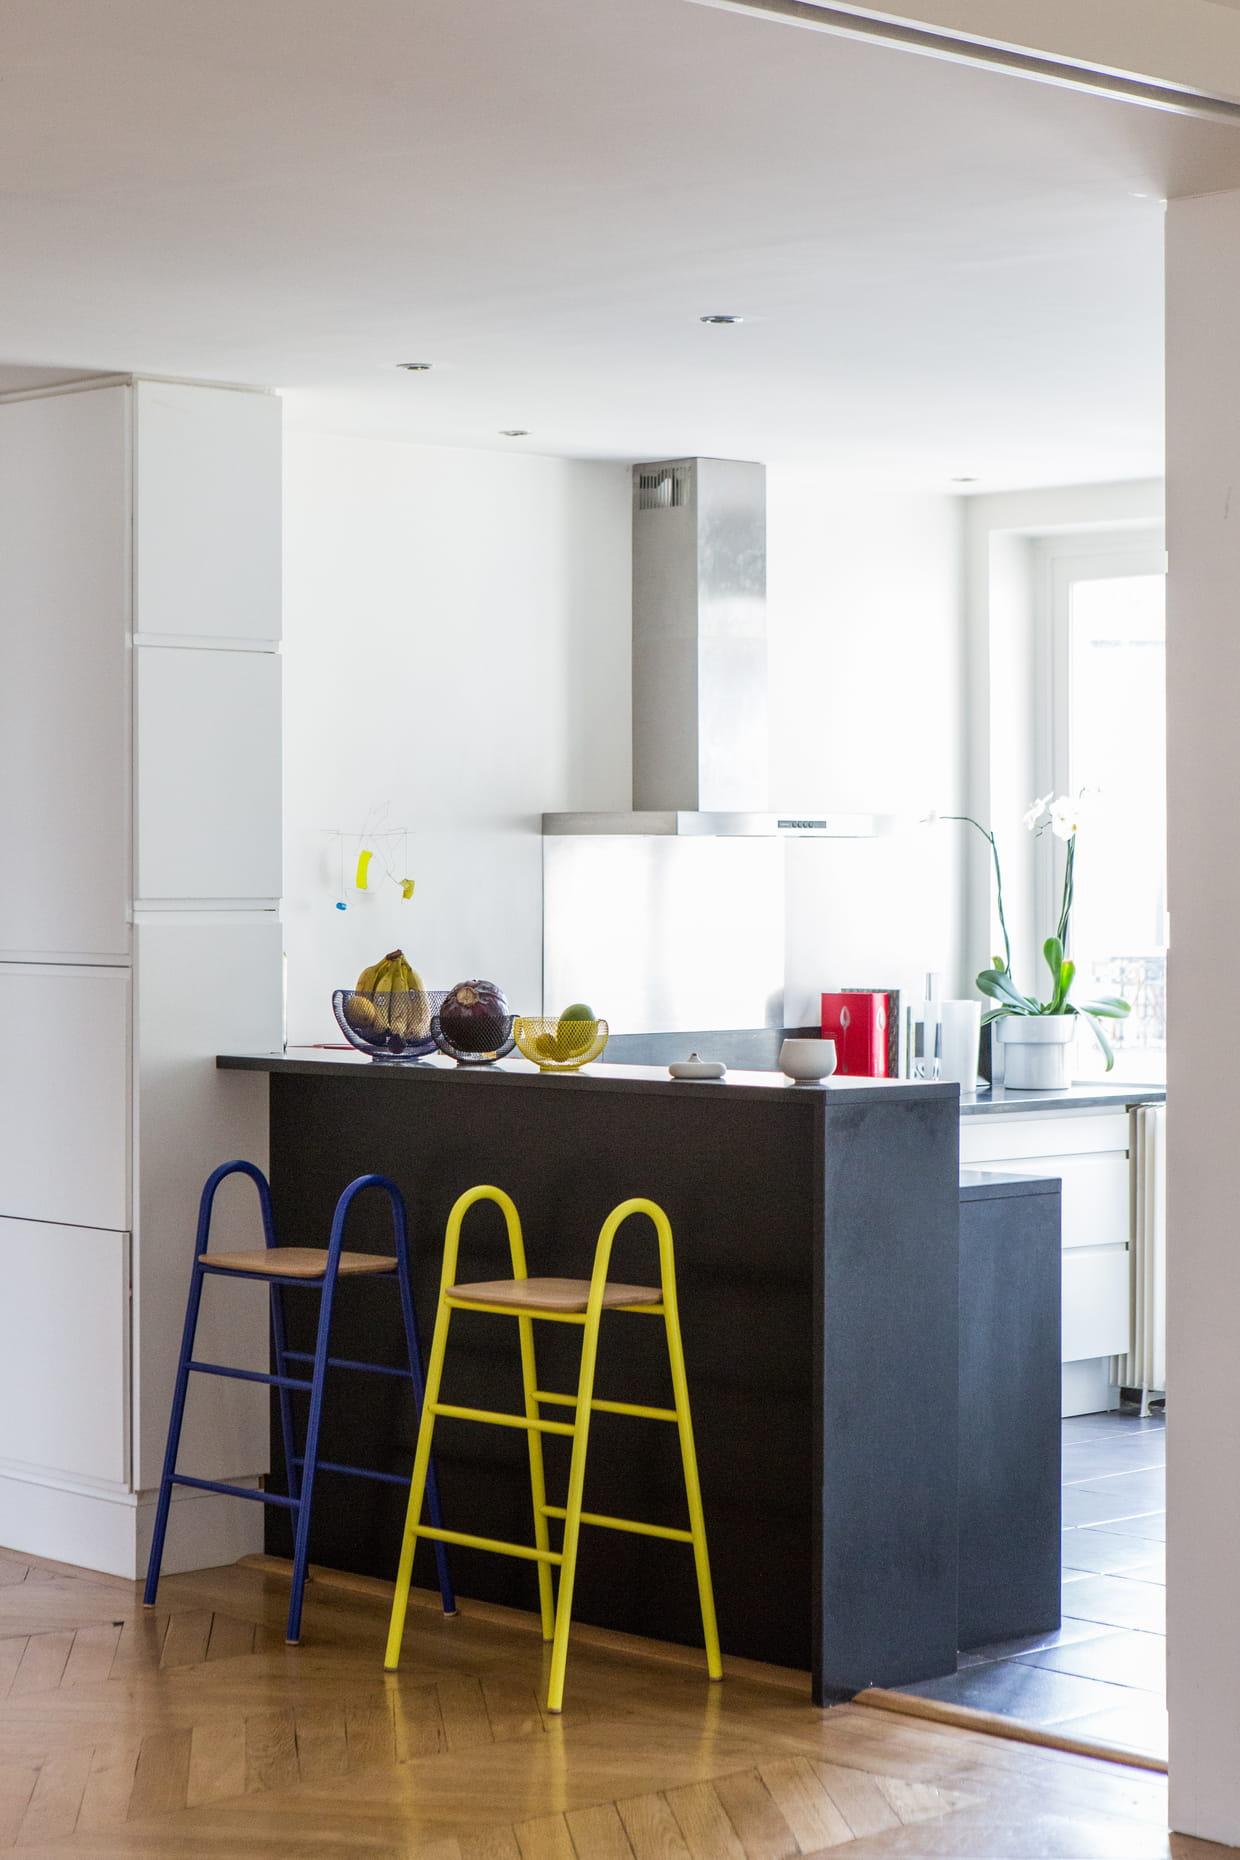 une cuisine ouverte lumineuse. Black Bedroom Furniture Sets. Home Design Ideas